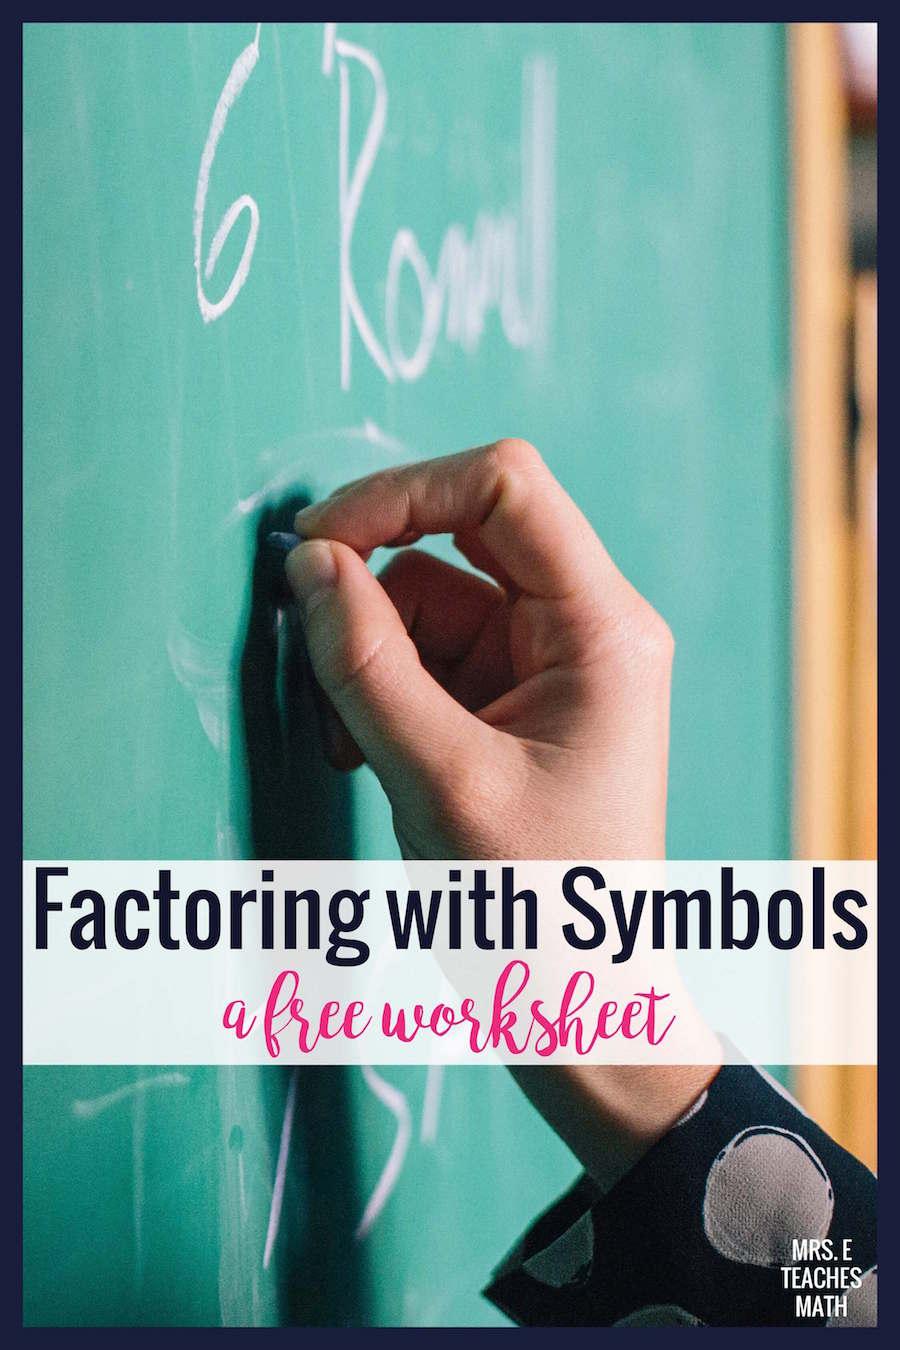 Factoring with Symbols | Mrs. E Teaches Math